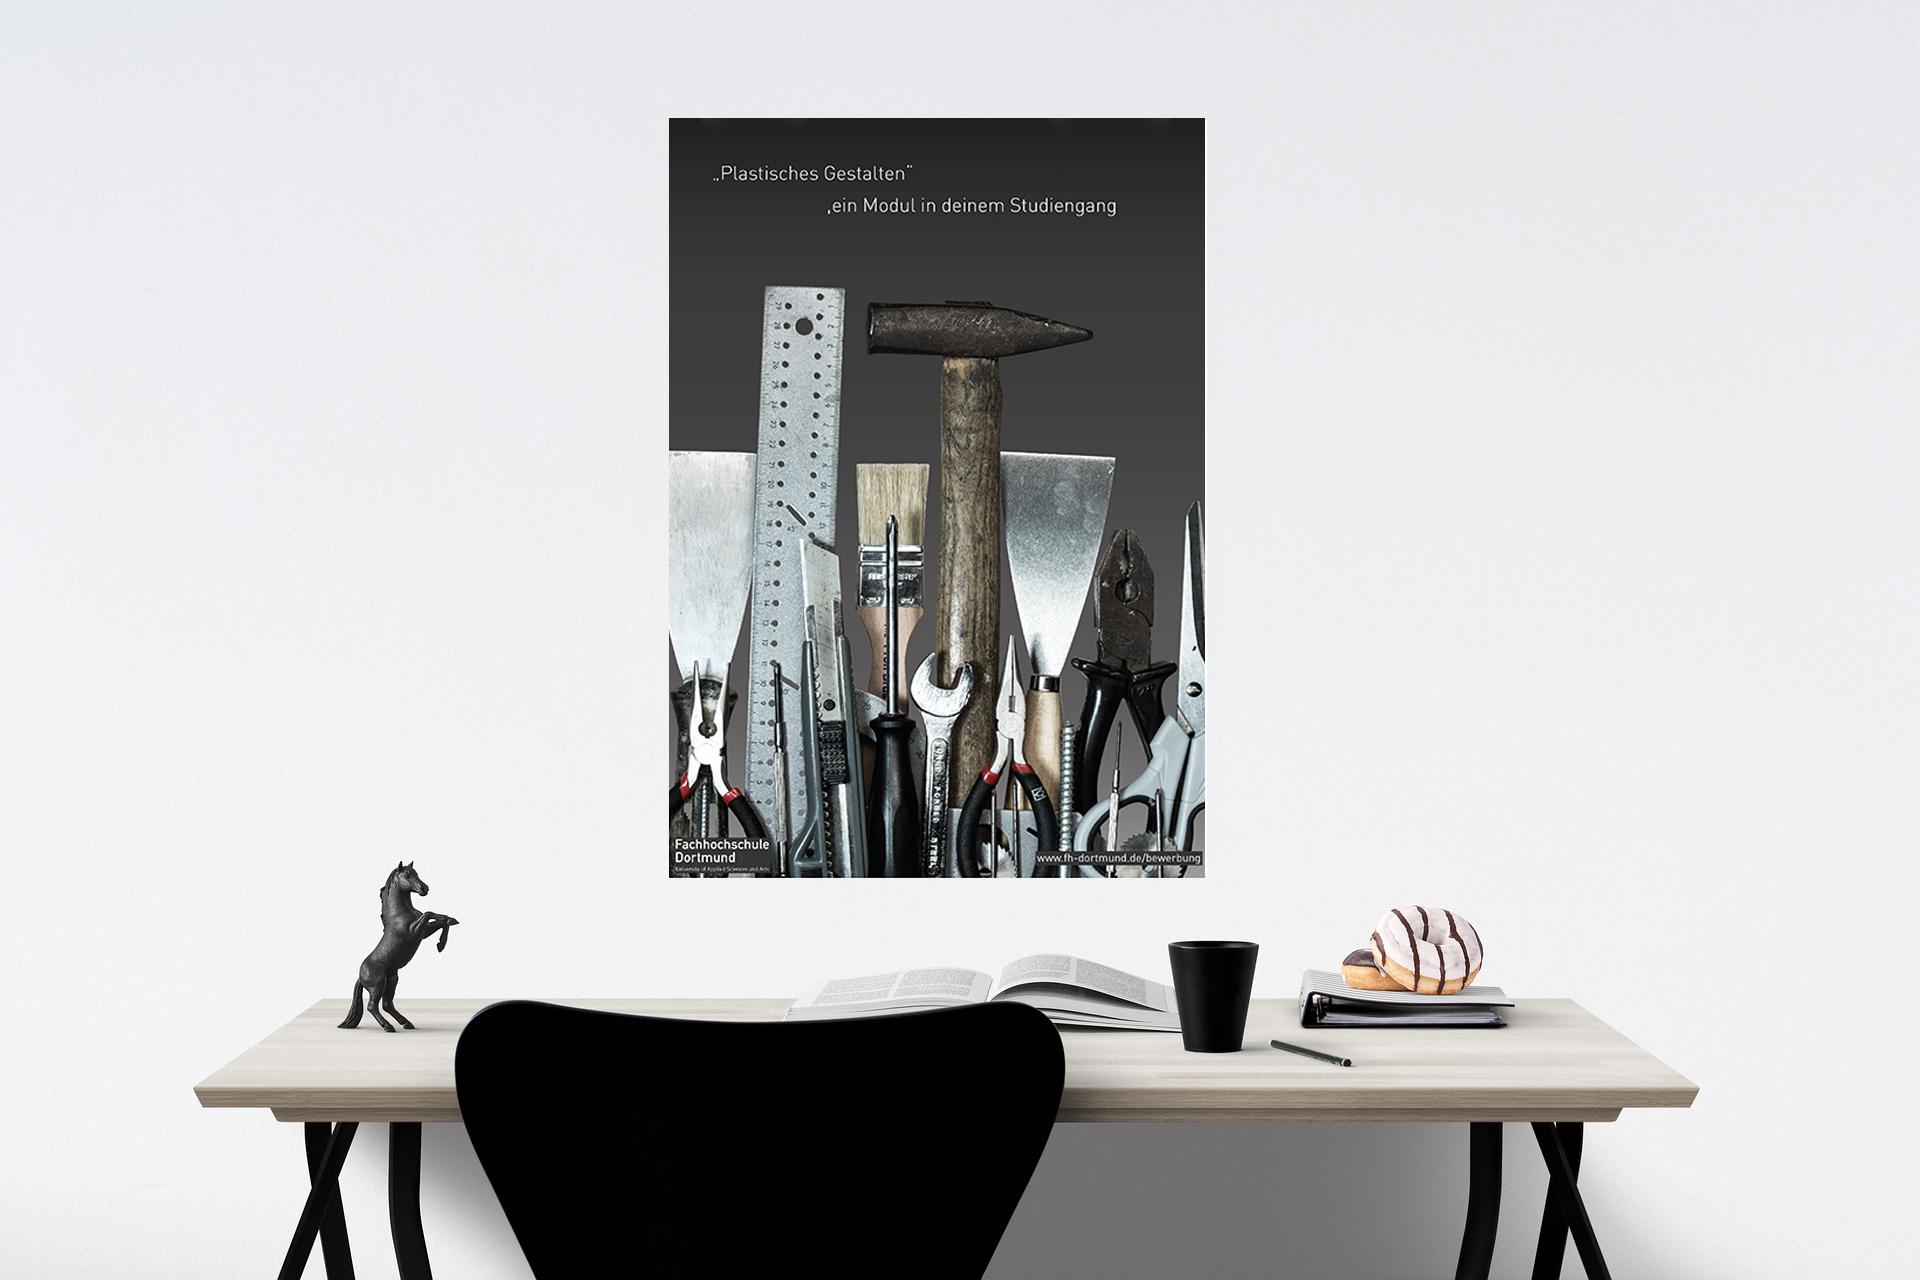 Fh_Dortmund-Design_Poster